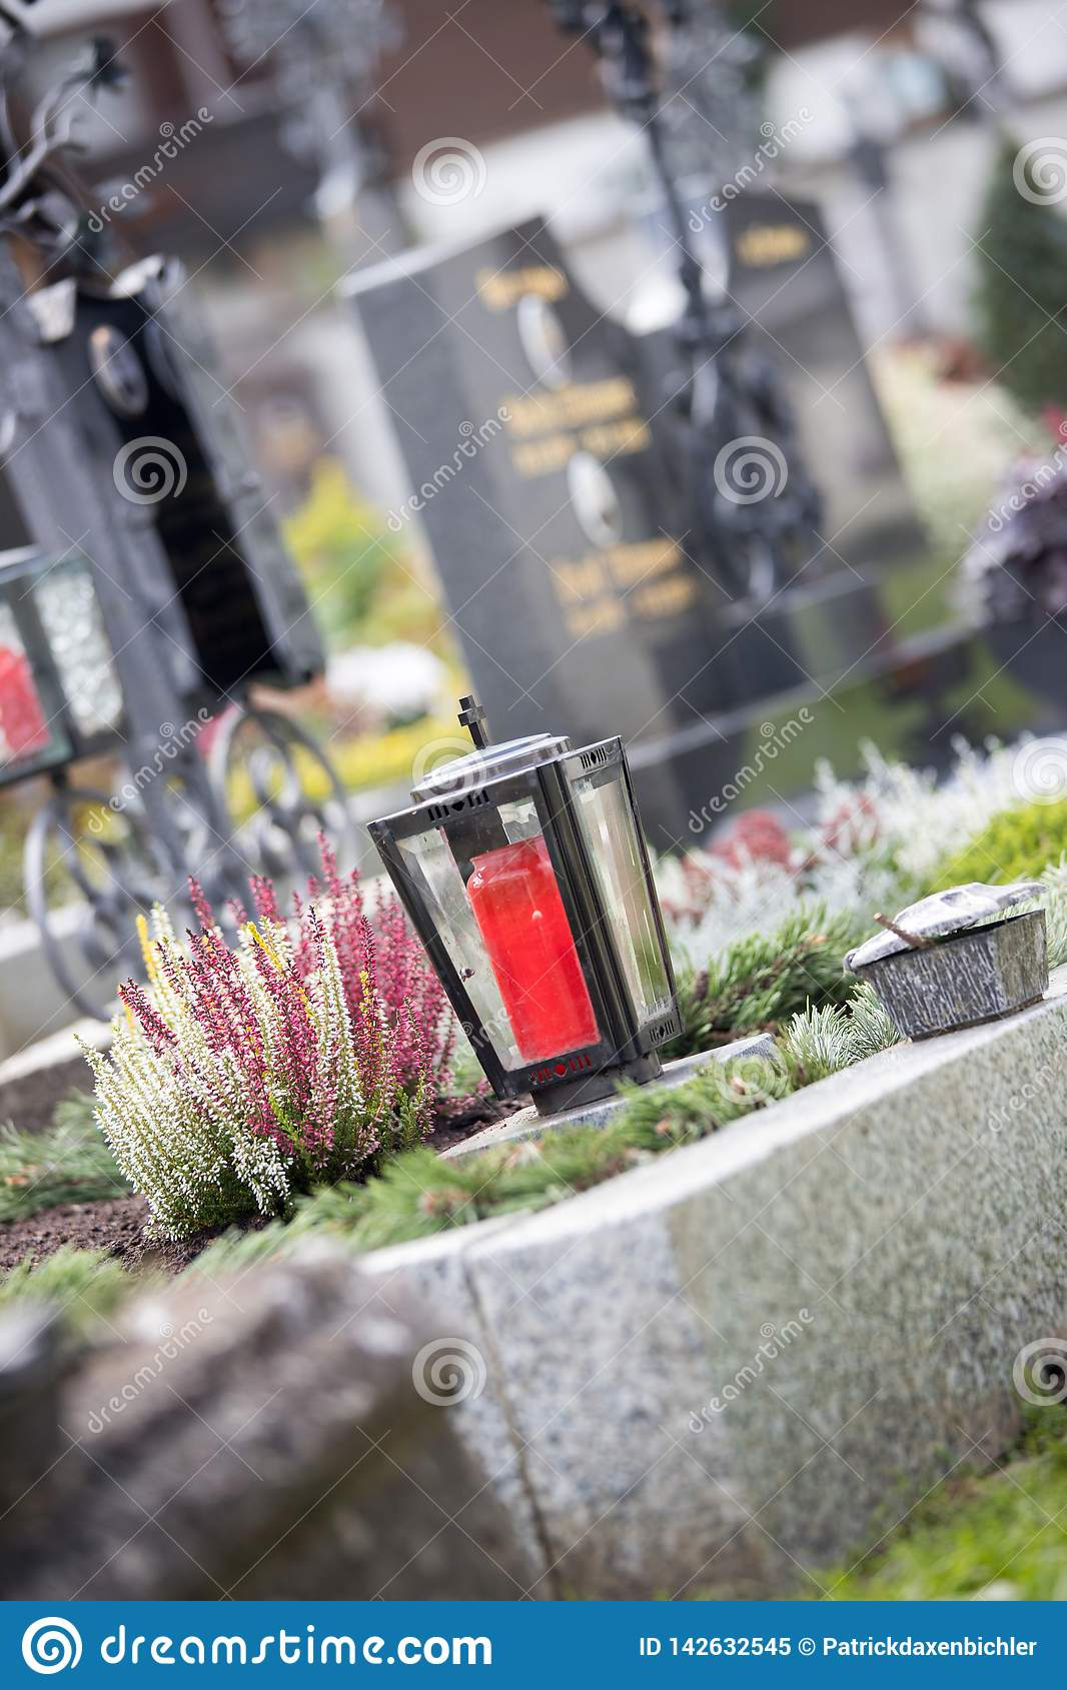 Candela/lanterna al cimitero, funerale, dispiacere